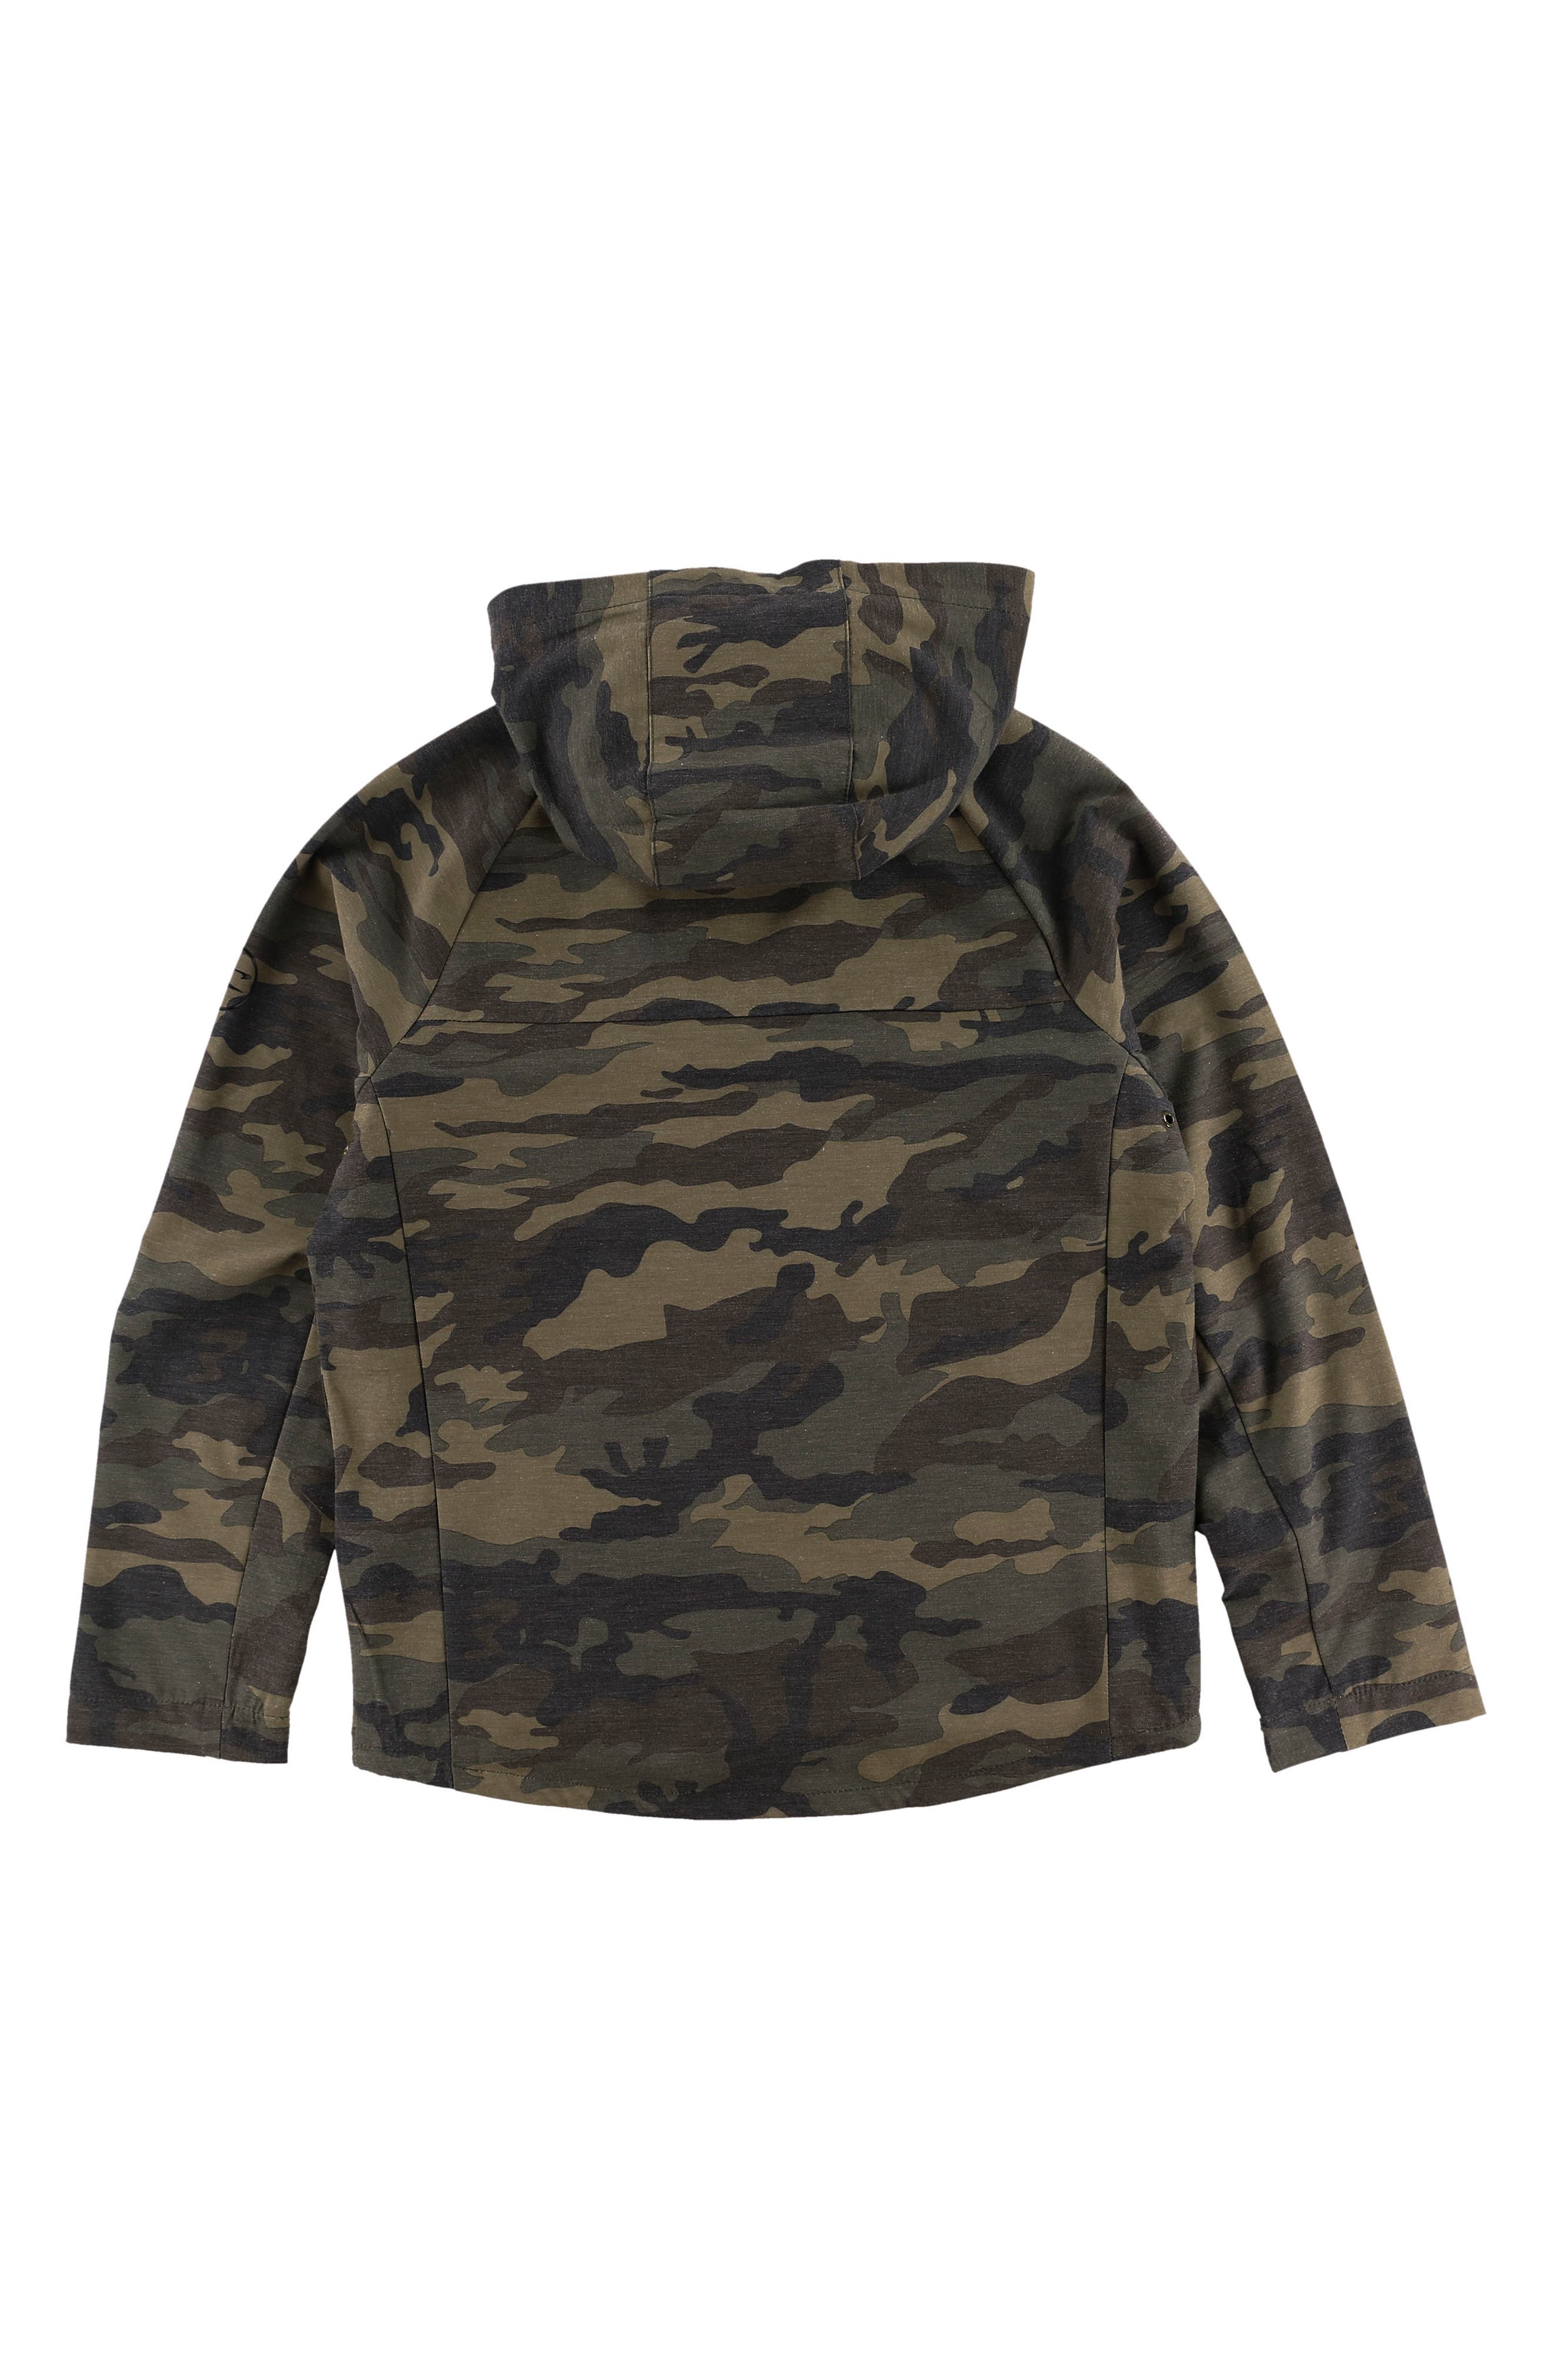 Alternate Image 2  - O'Neill Traveler Dawn Patrol Camo Hooded Windbreaker Jacket (Big Boys)